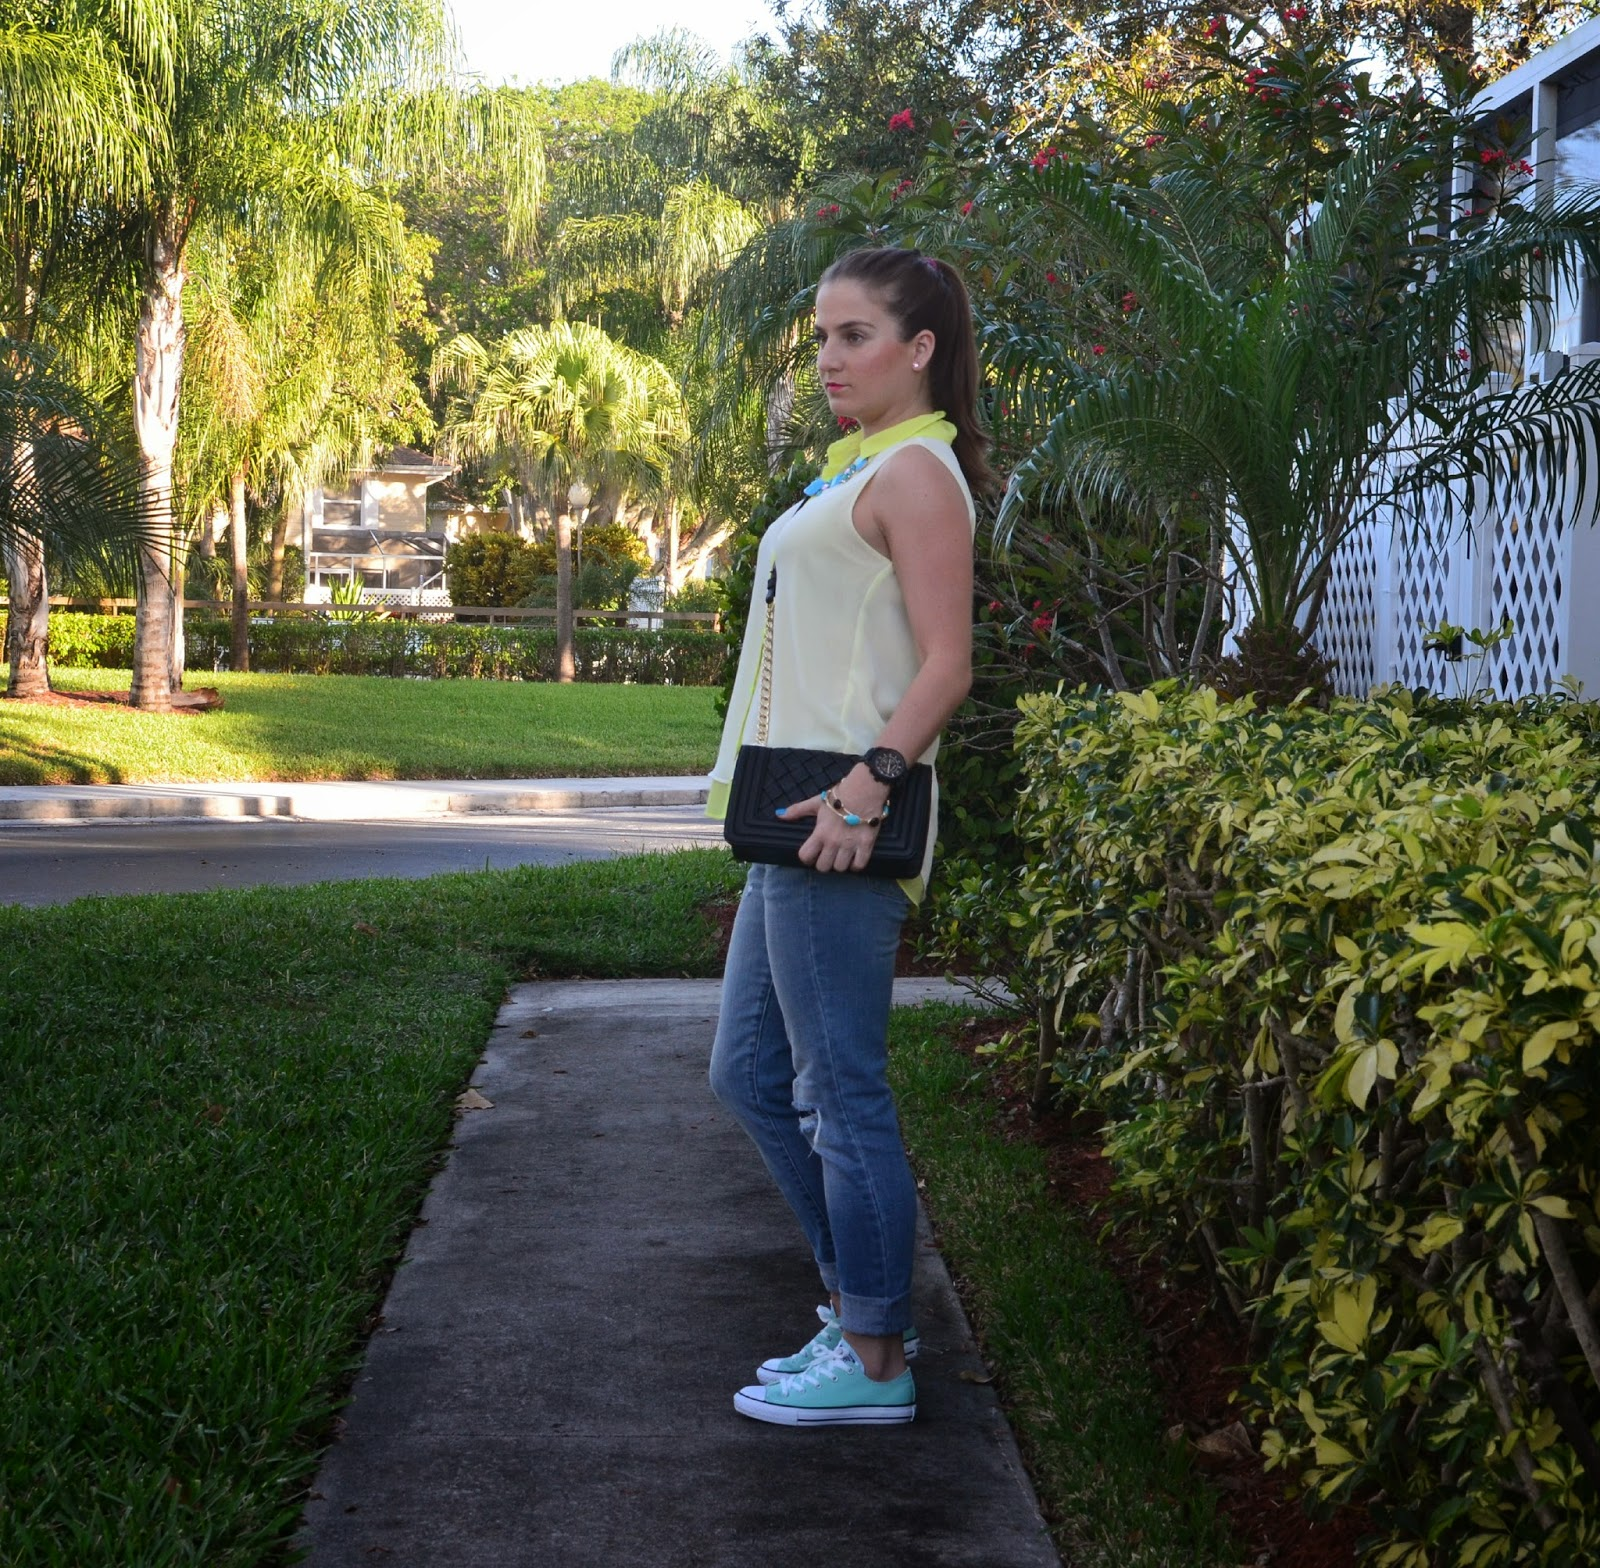 Boyfriend jeans Chuck taylor Neon top Black clutch